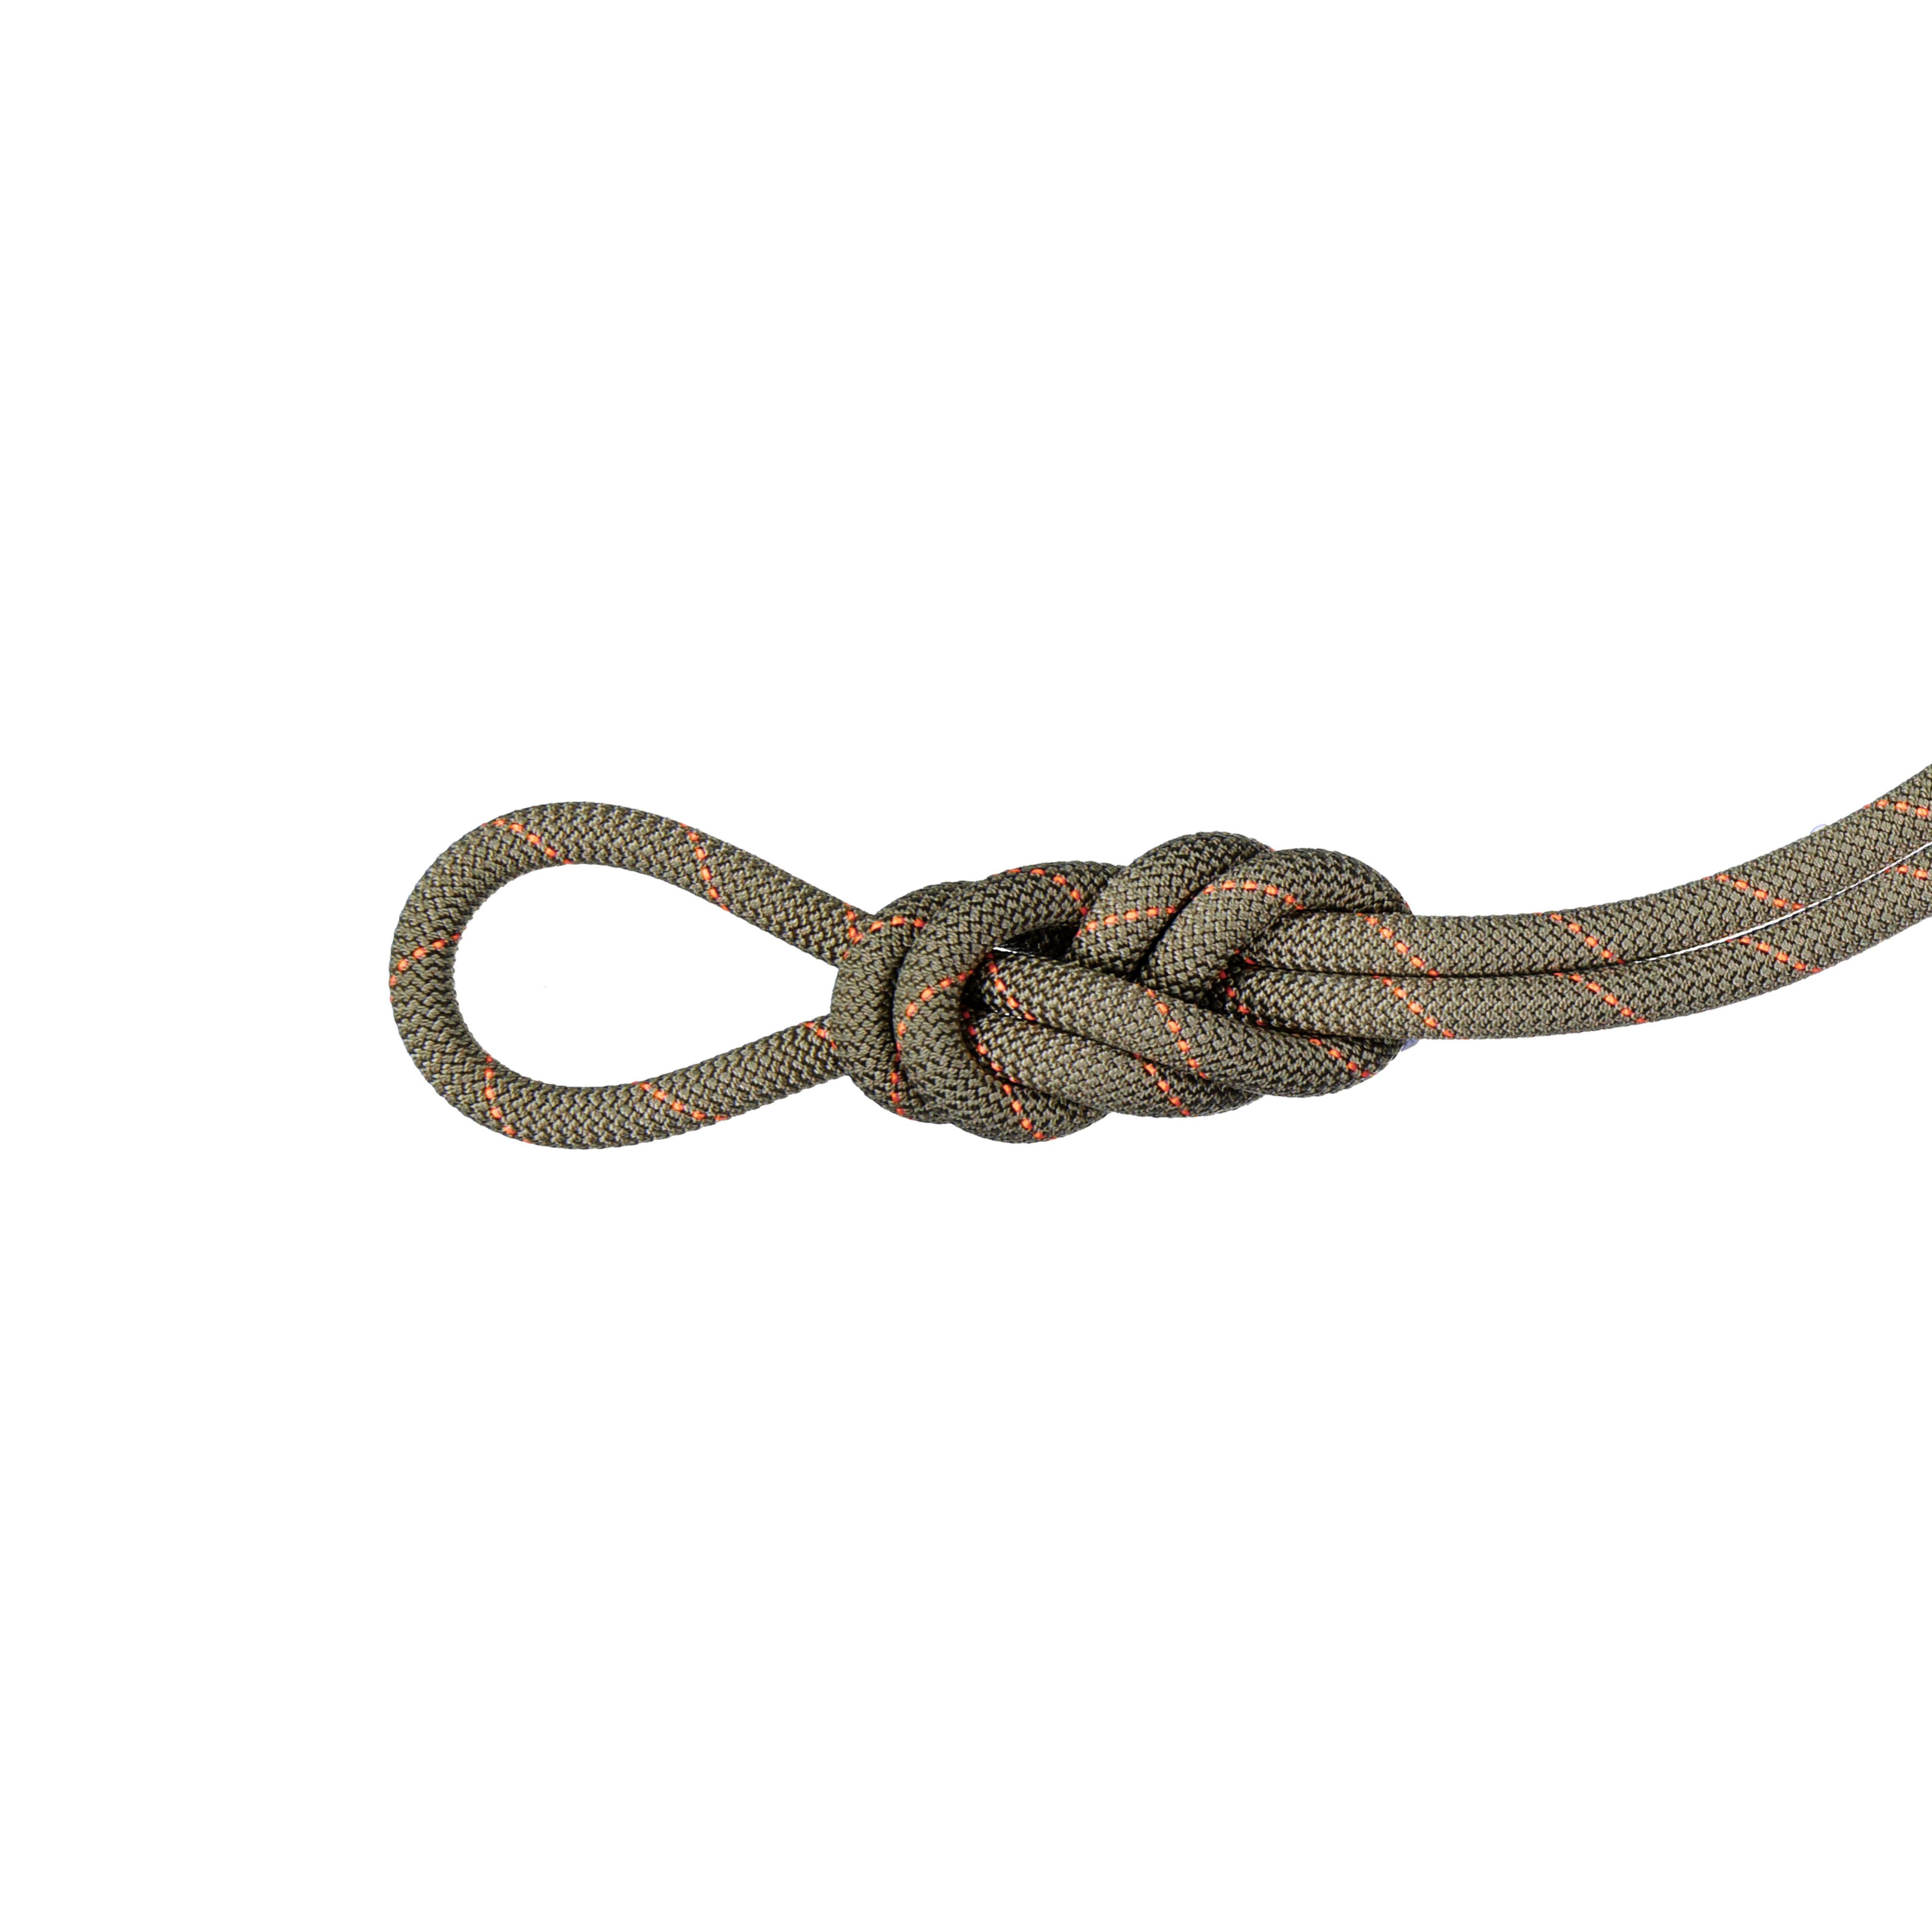 9.9 Gym Workhorse Classic Rope - 40 m, Classic Standard, boa thumbnail